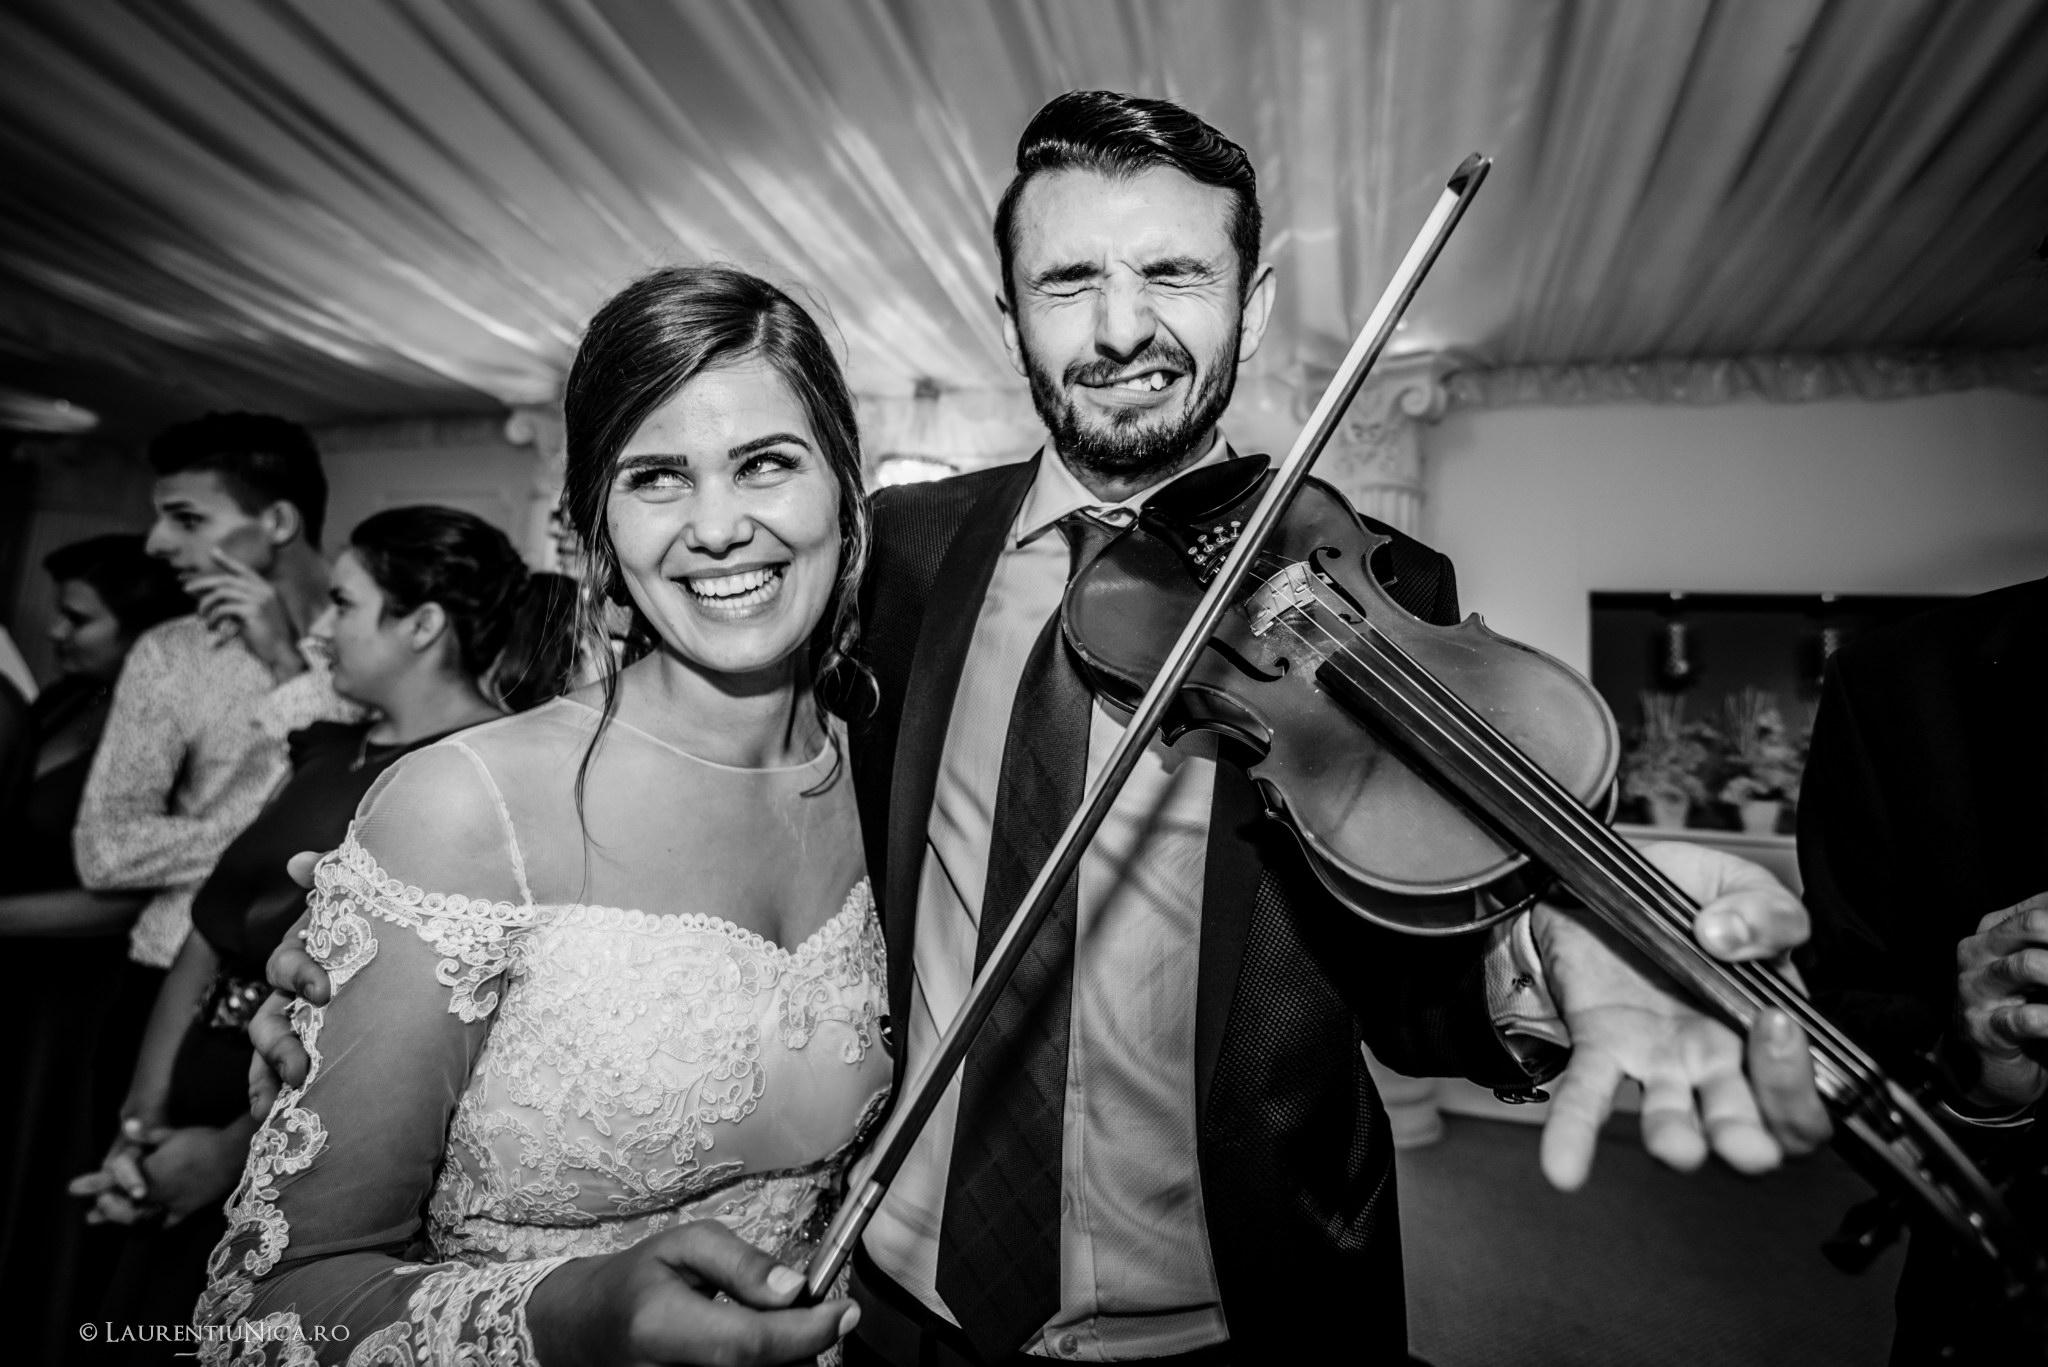 Alina si Andrei fotograf nunta laurentiu nica craiova 44 - Alina & Andrei | Fotografii nunta